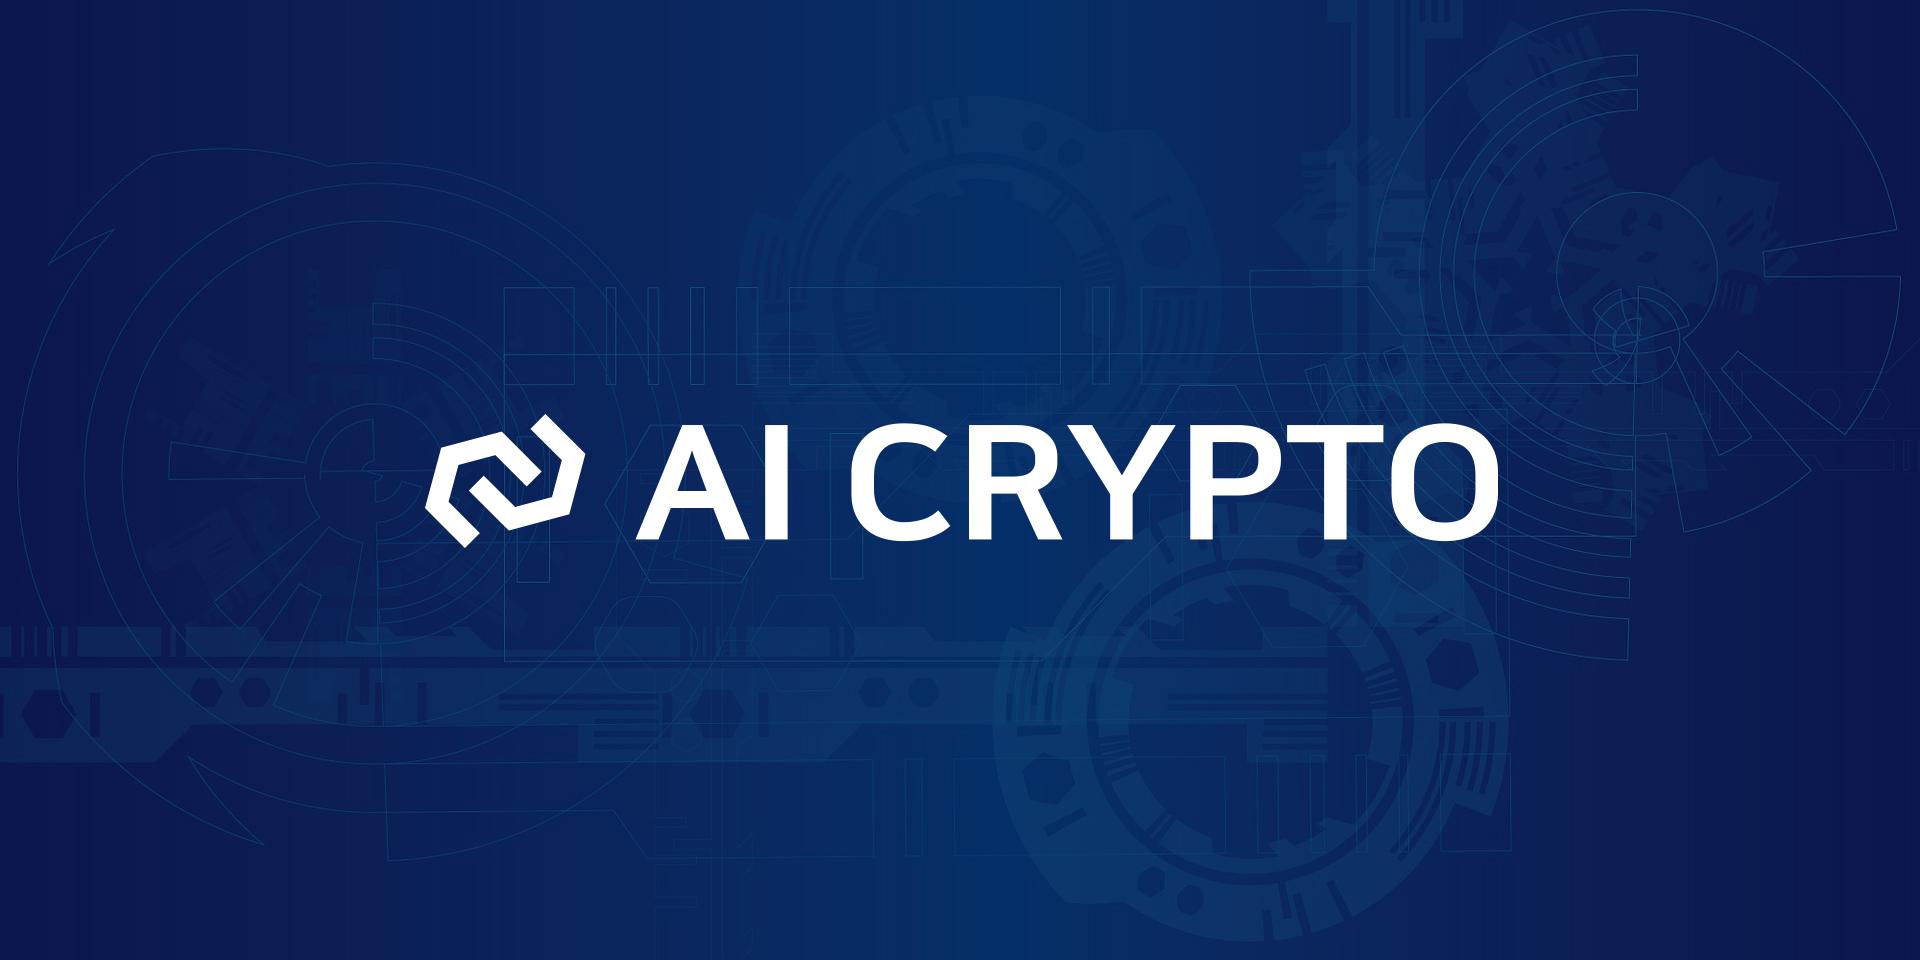 AI Crypto Airdrop » Claim 2900 free AIC tokens (~ $8 7 + ref)